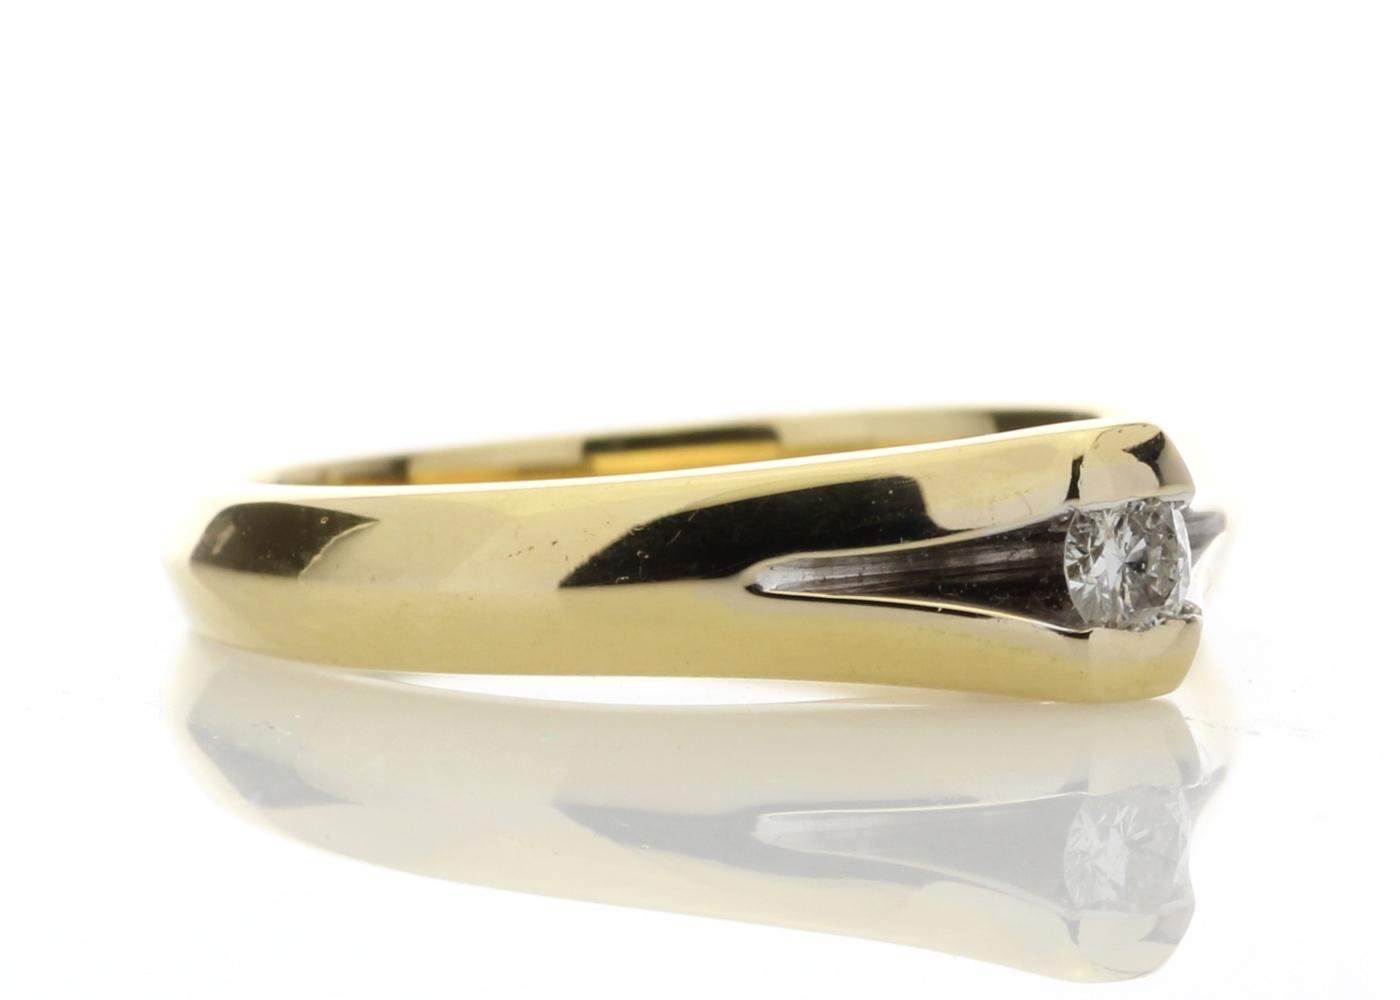 18ct Rub Over Set Diamond Ring F SI 0.10 Carats - Image 4 of 4